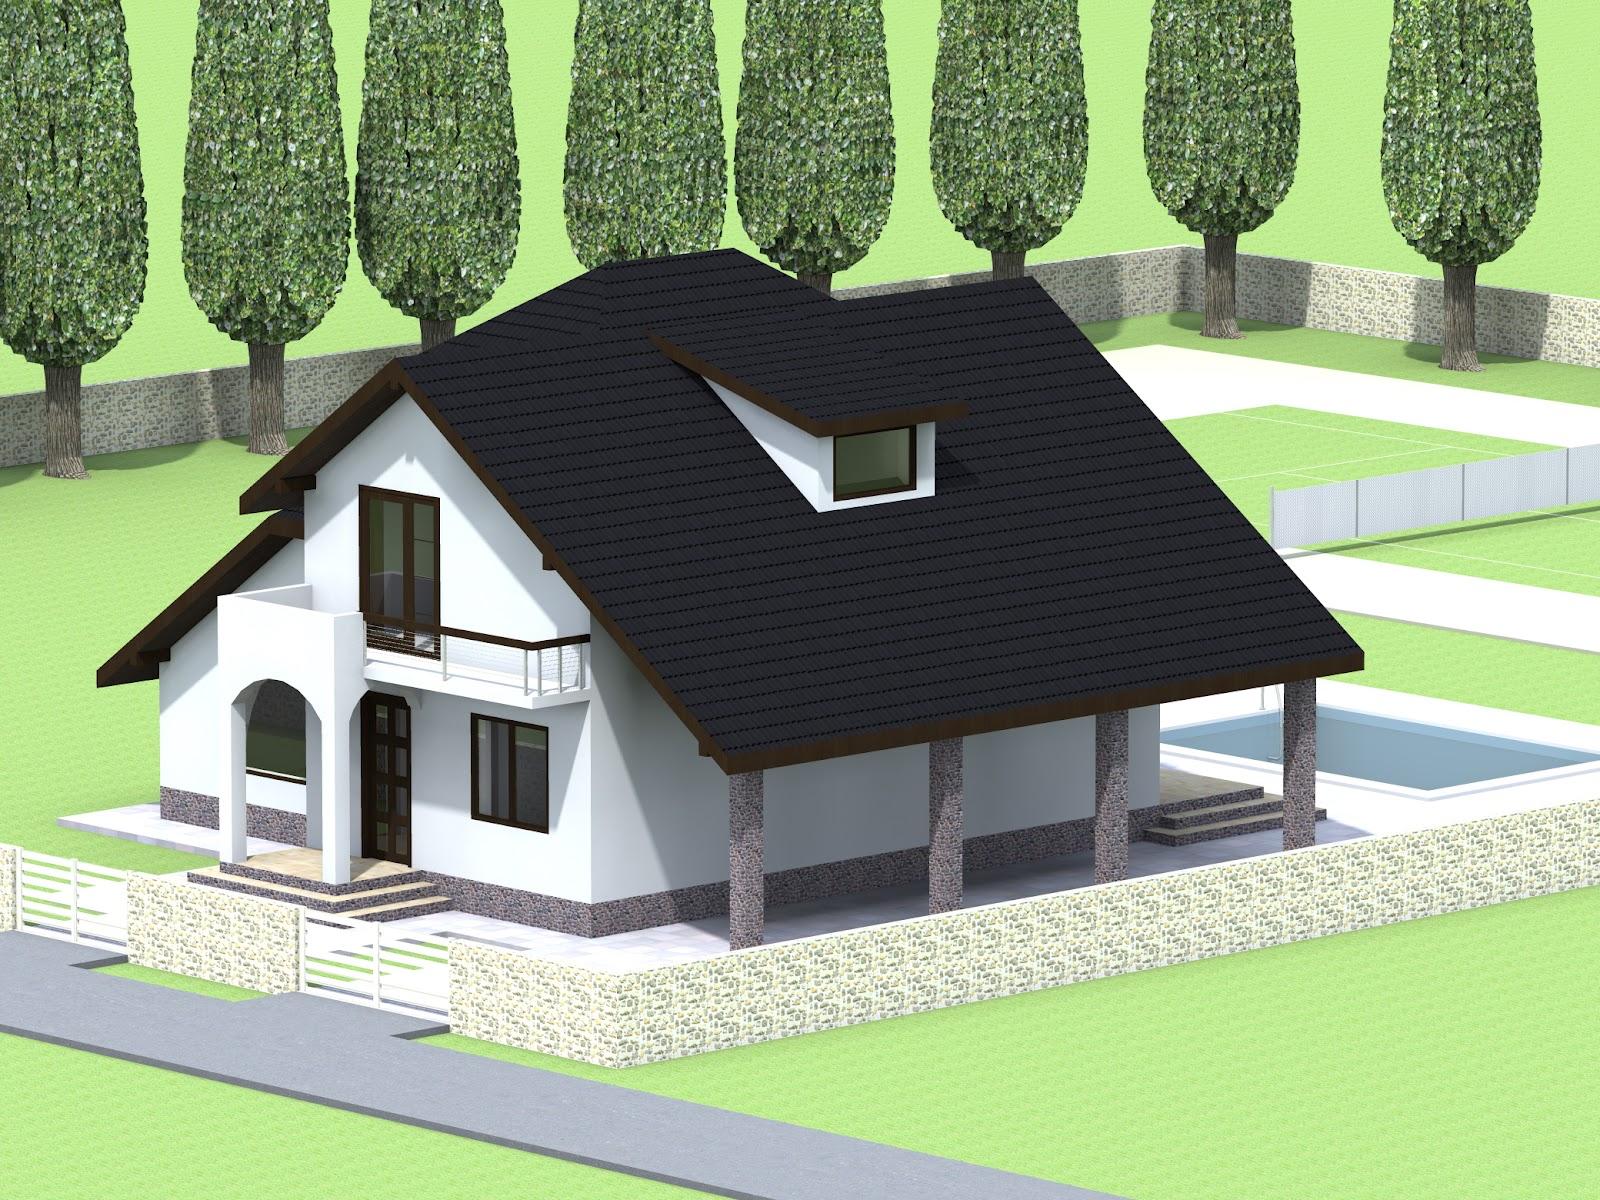 Proiecte constructii for Arhitectura case cu mansarda